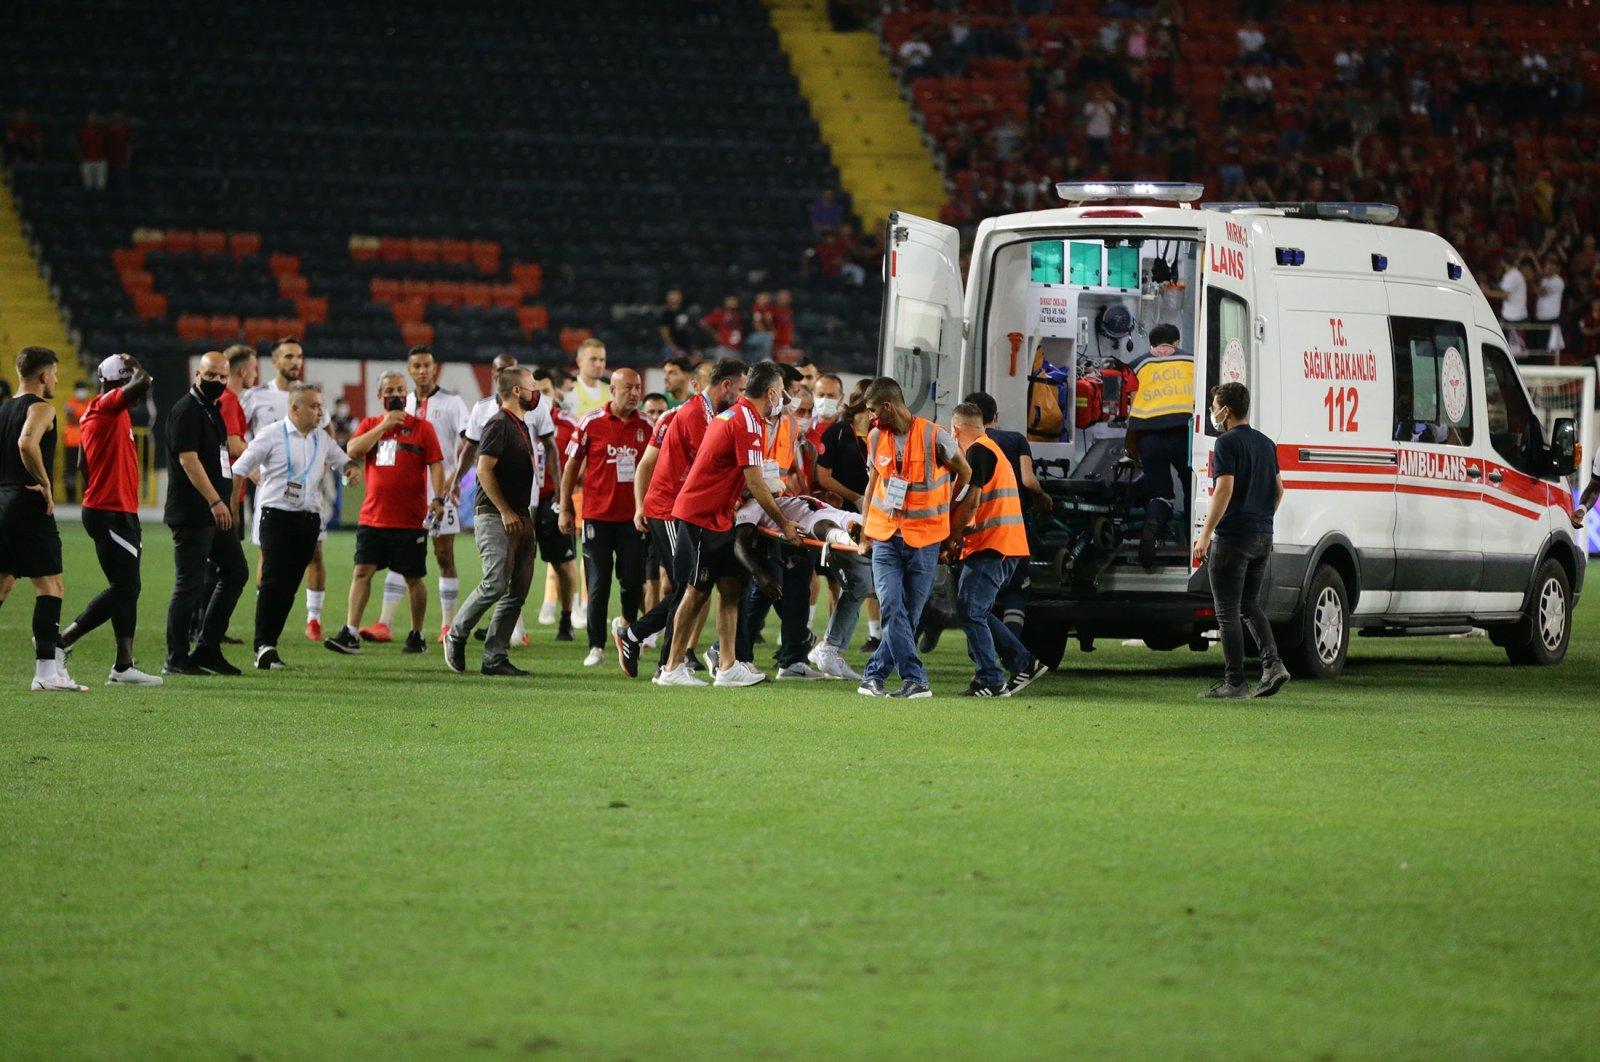 Beşiktaş defender Fabrice N'Sakala is carried on stretcher to an ambulance after his collapse during Beşiktaş match against Gaziantep in Turkish Süper Lig, at Kalyon Stadium, Gaziantep, Turkey, Aug. 21, 2021. (AA Photo)